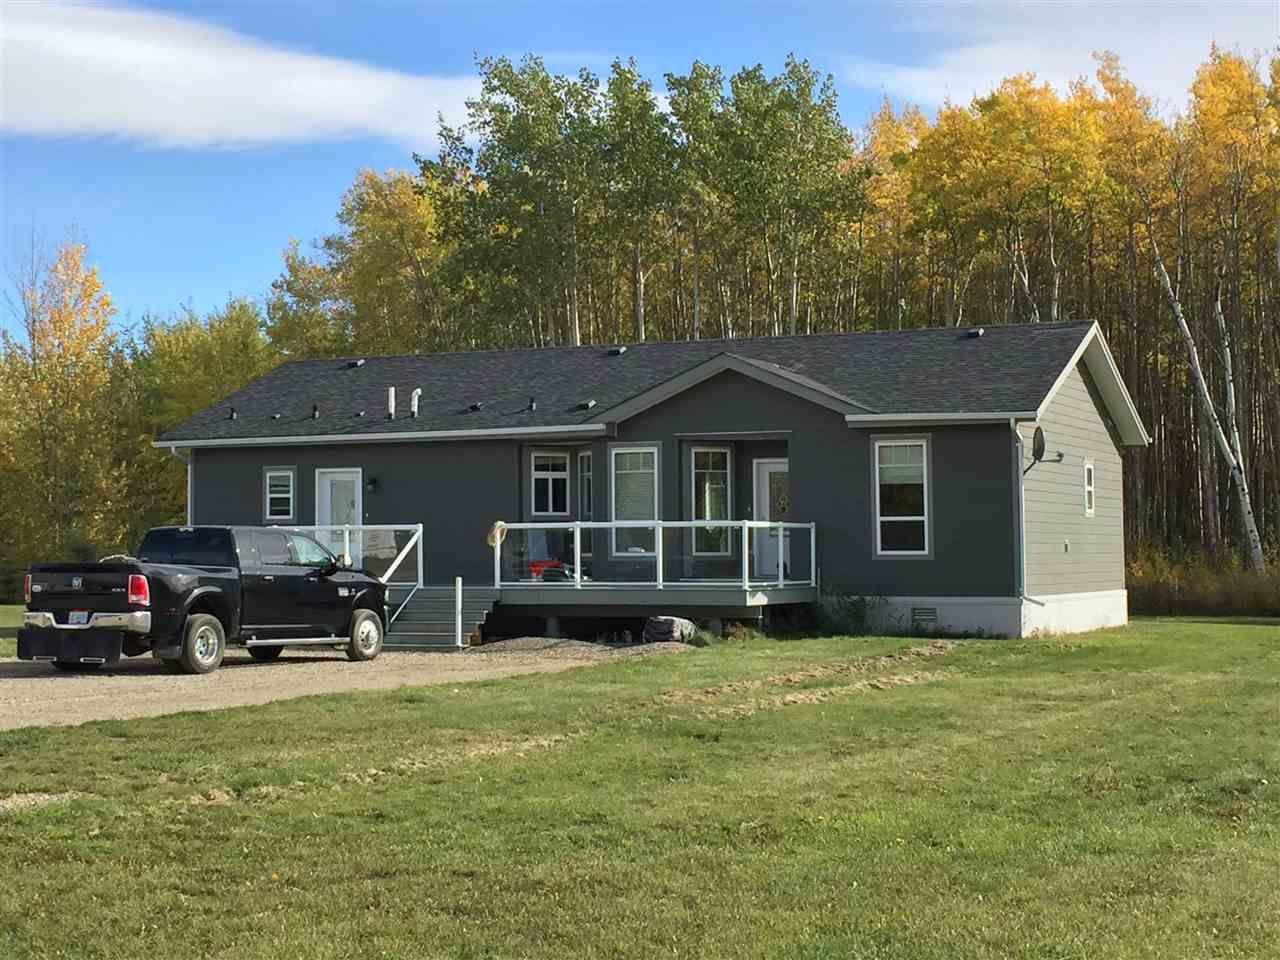 Main Photo: 9808 MAPLE Street in FT ST JOHN: Fort St. John - Rural W 100th Manufactured Home for sale (Fort St. John (Zone 60))  : MLS®# R2002304